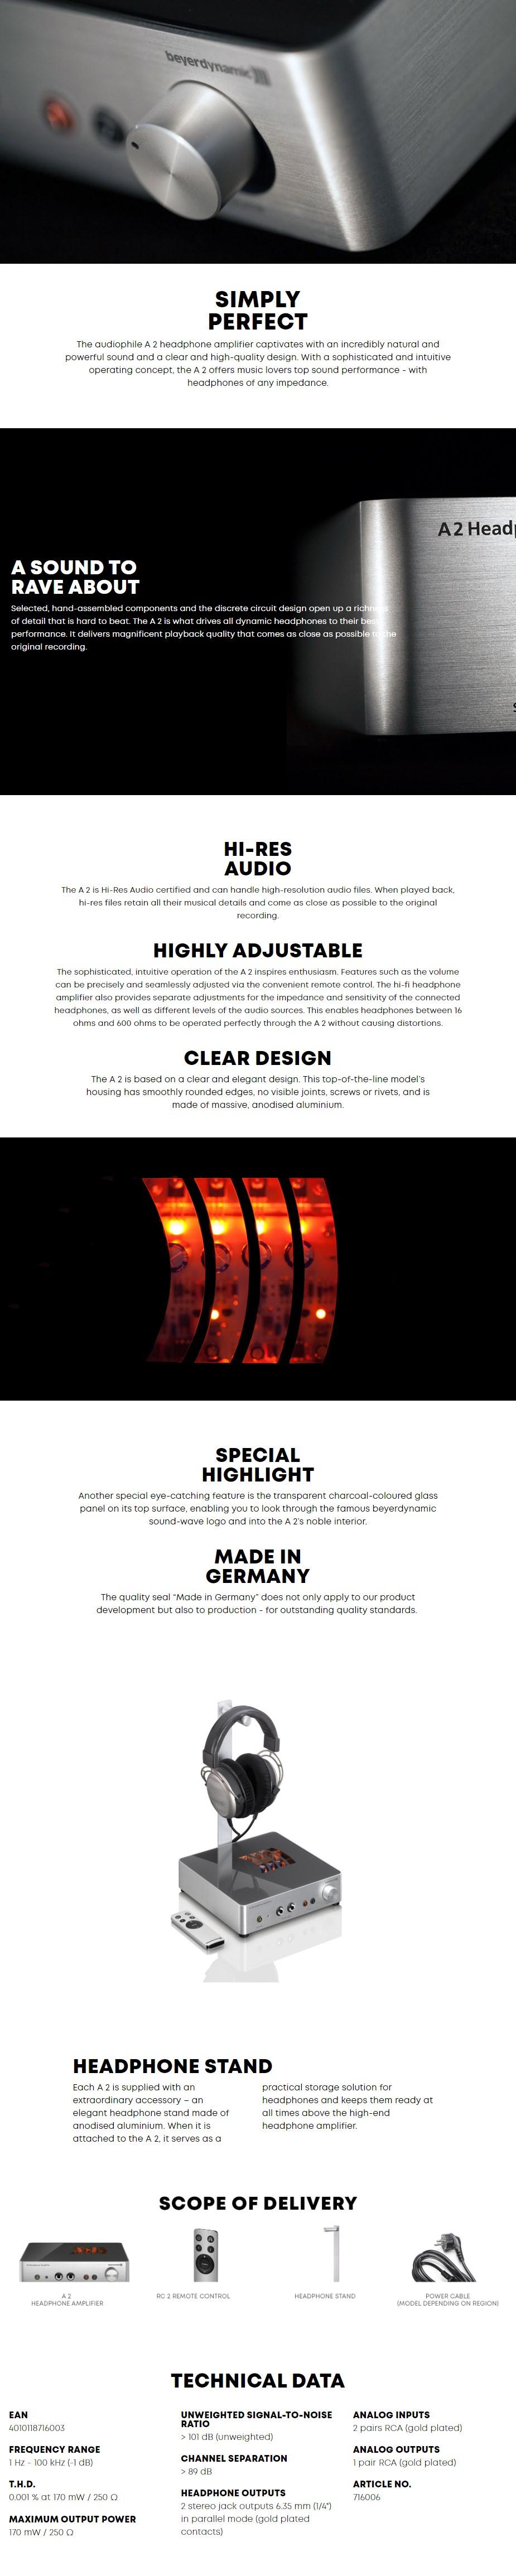 Beyerdynamic A2 Audiophile headphone amplifier - Desktop Overview 1